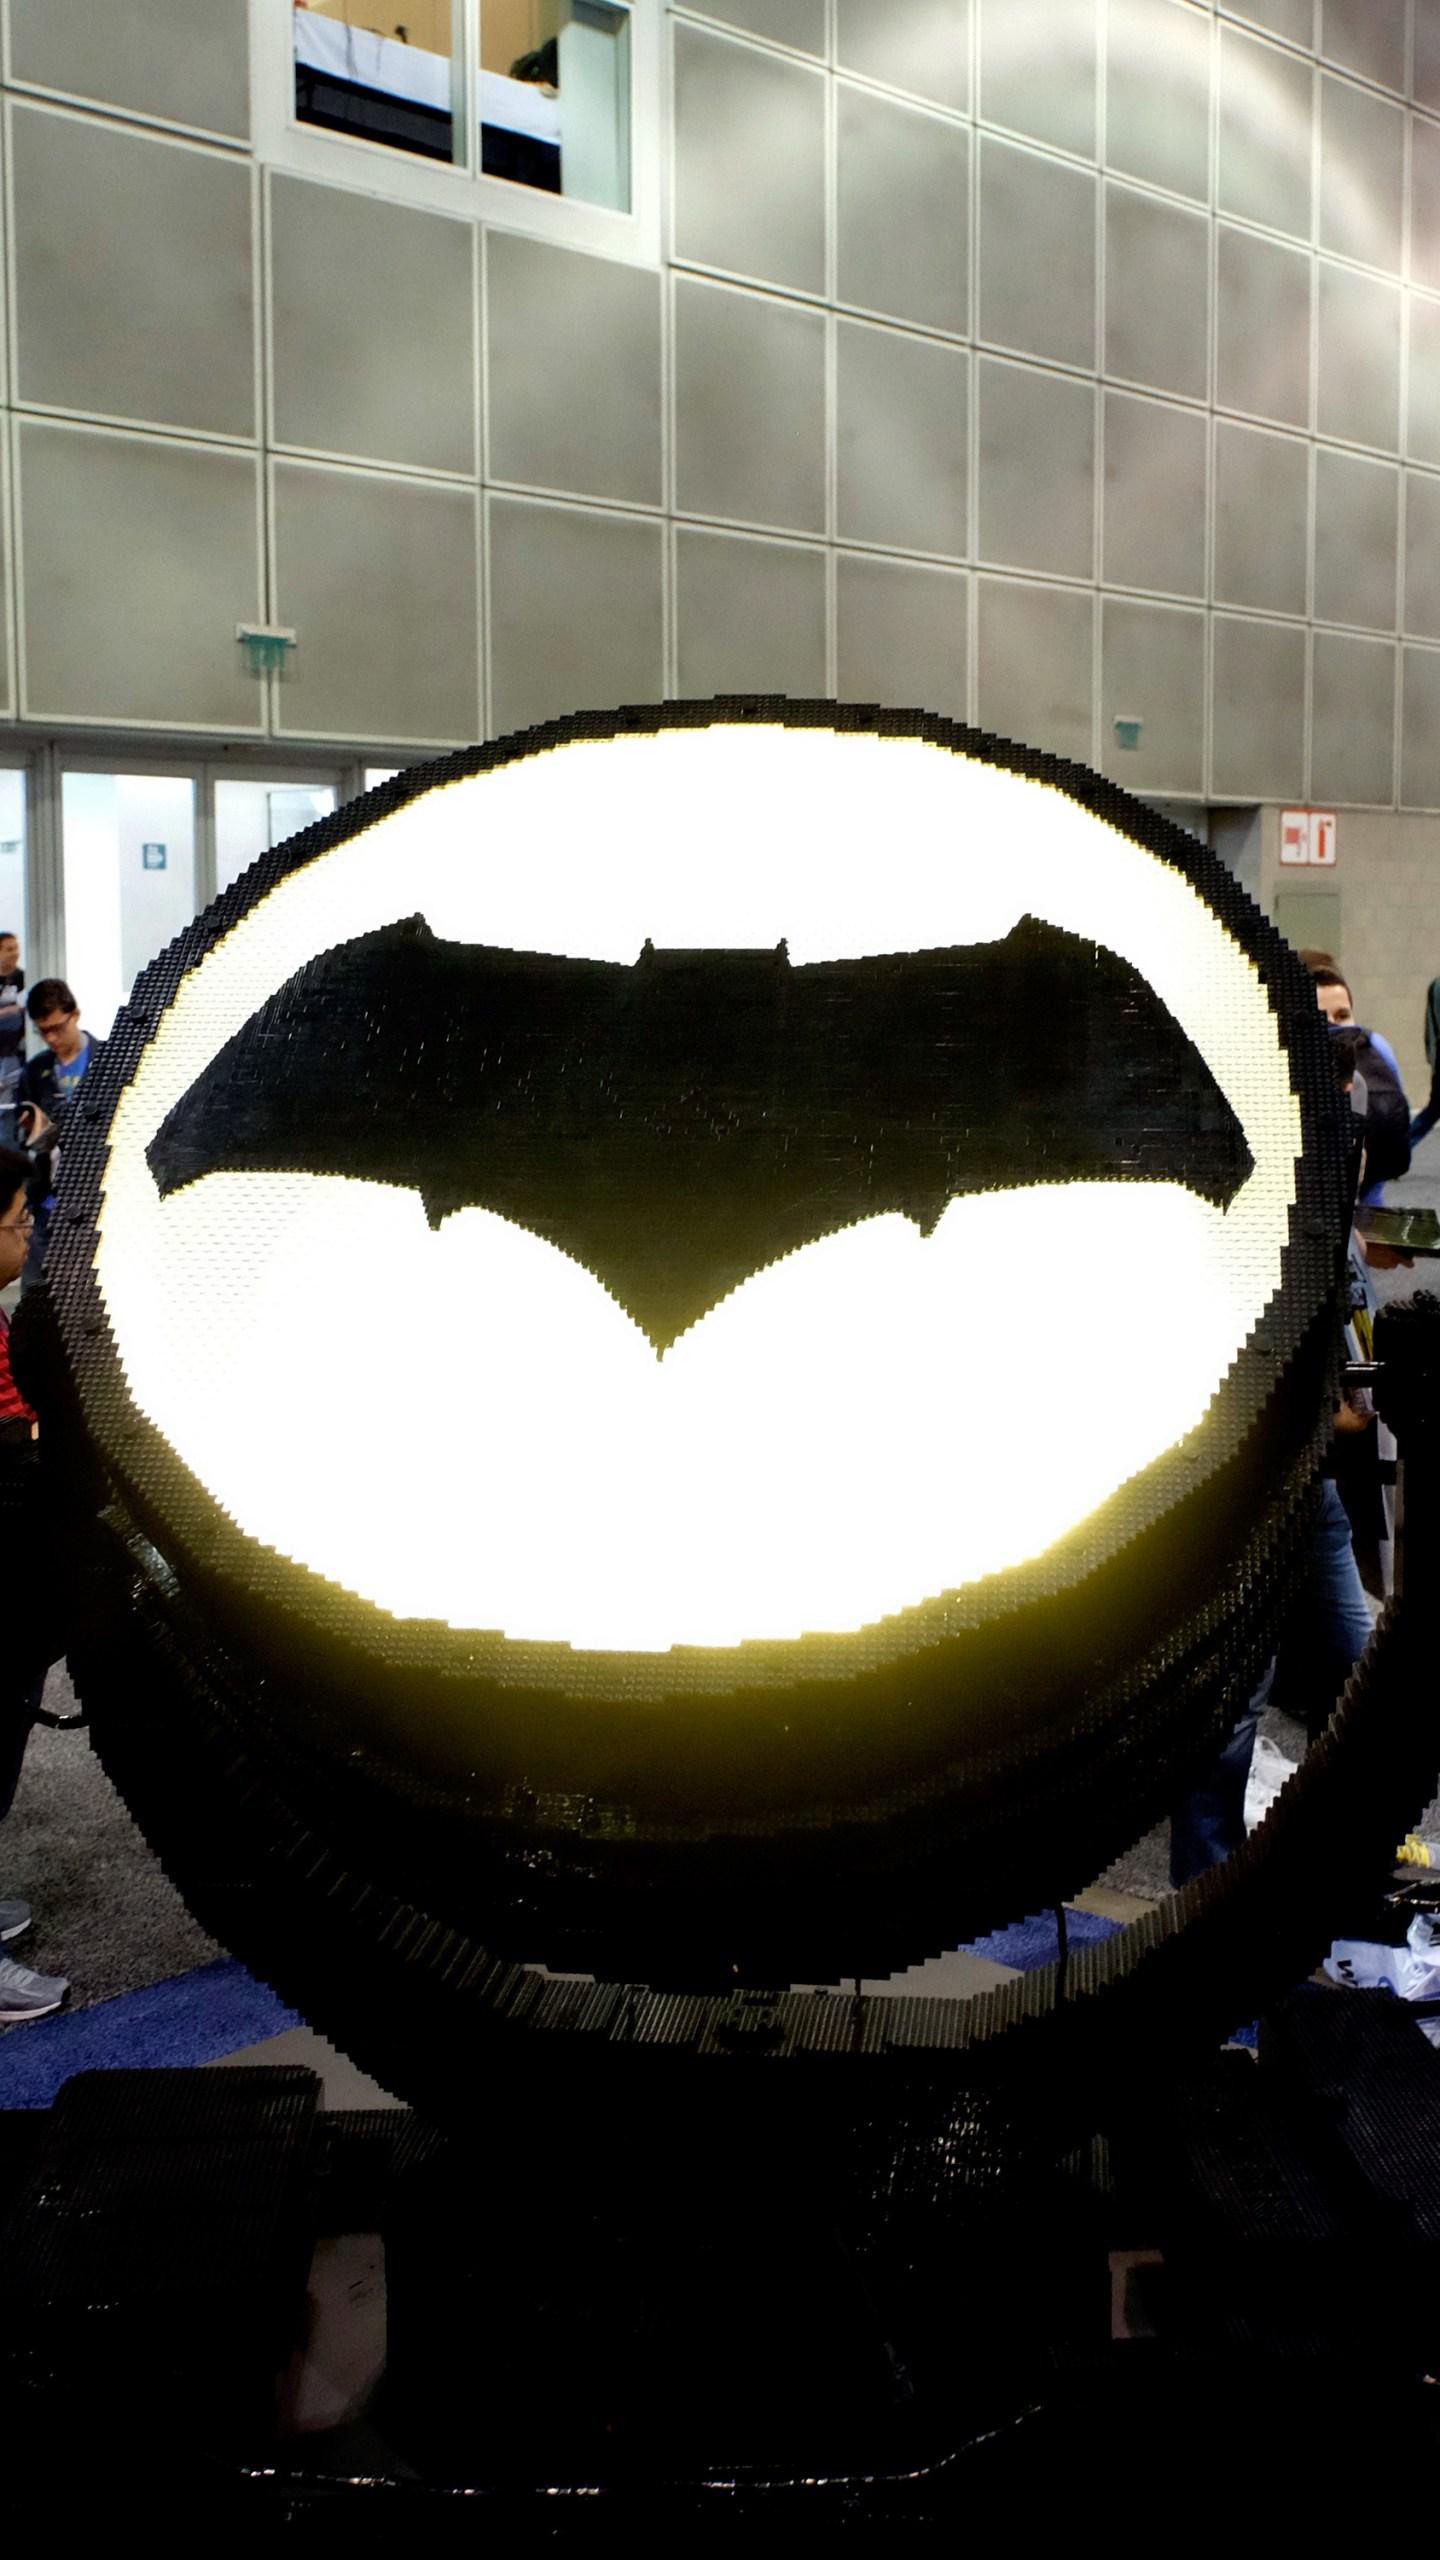 bat signal94362288-159532